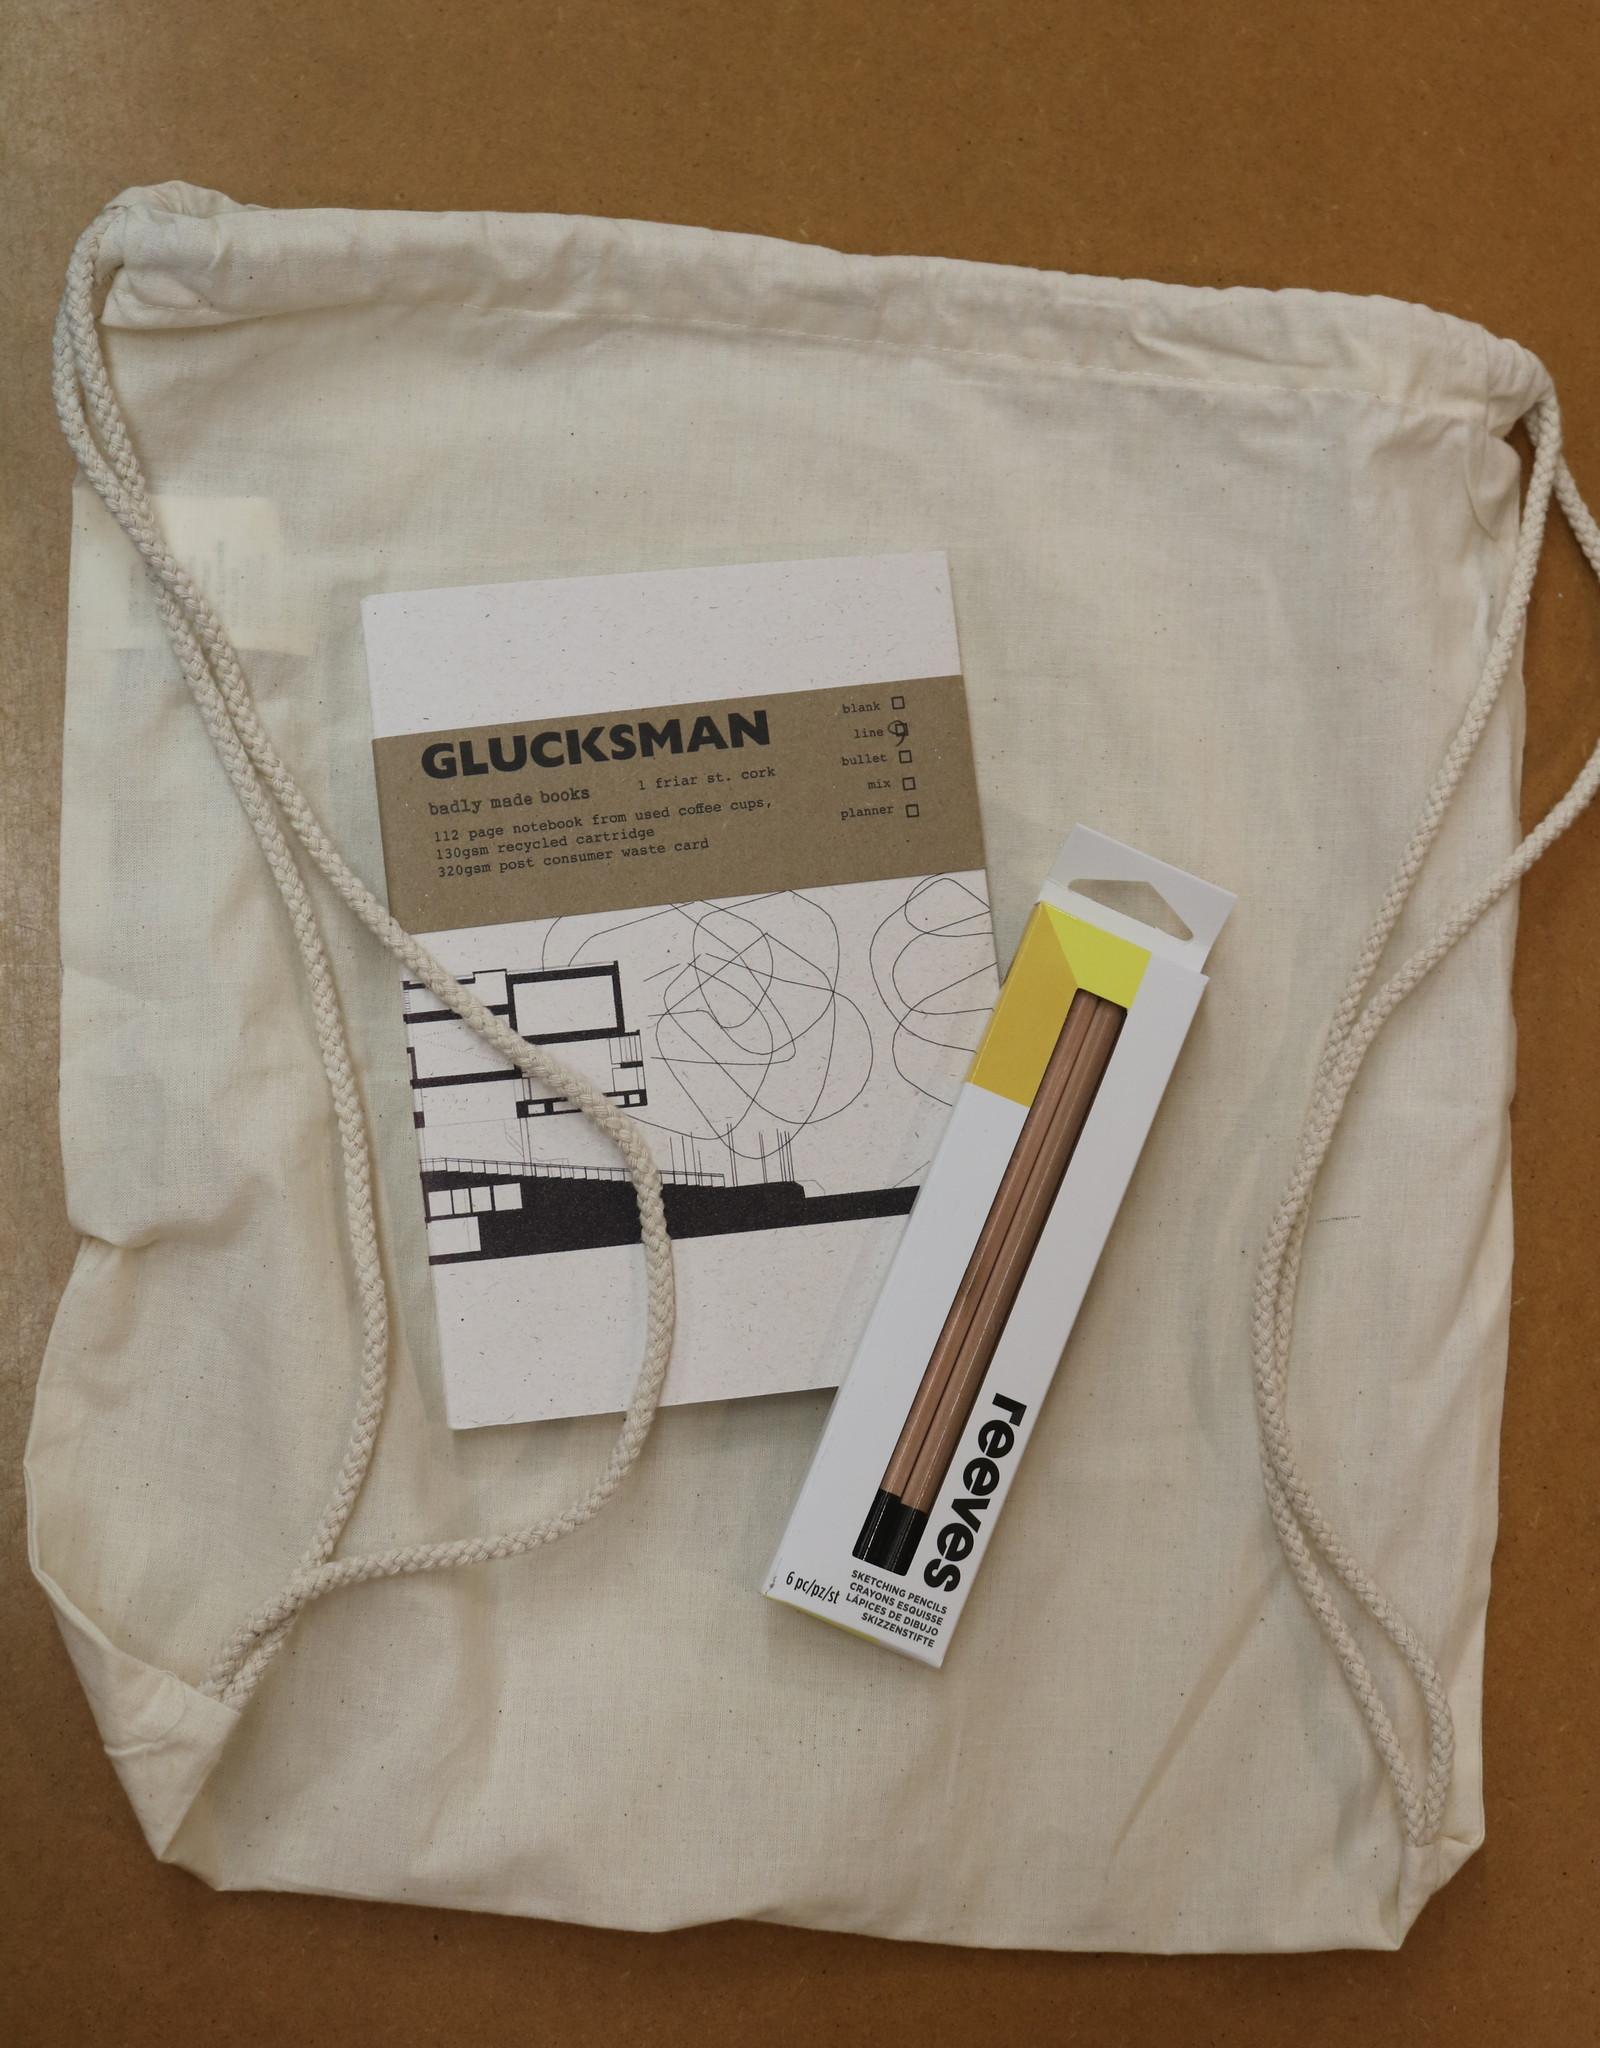 The Glucksman Creative Kit Glucksman